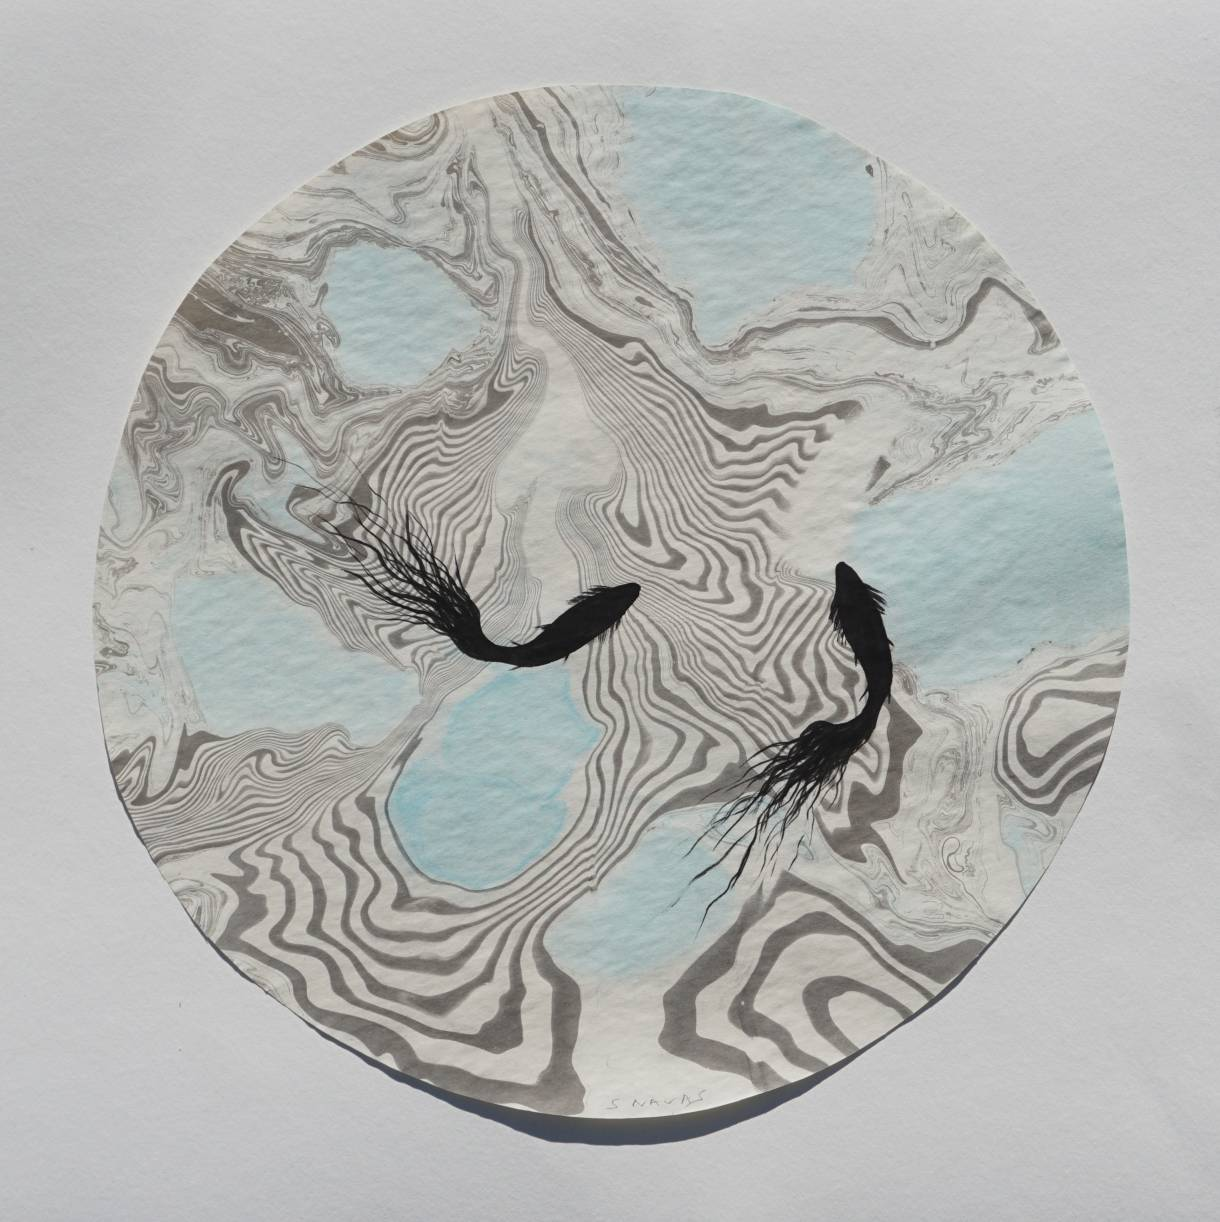 Tondo suminagashi peces I (2017) - Sebastián Navas